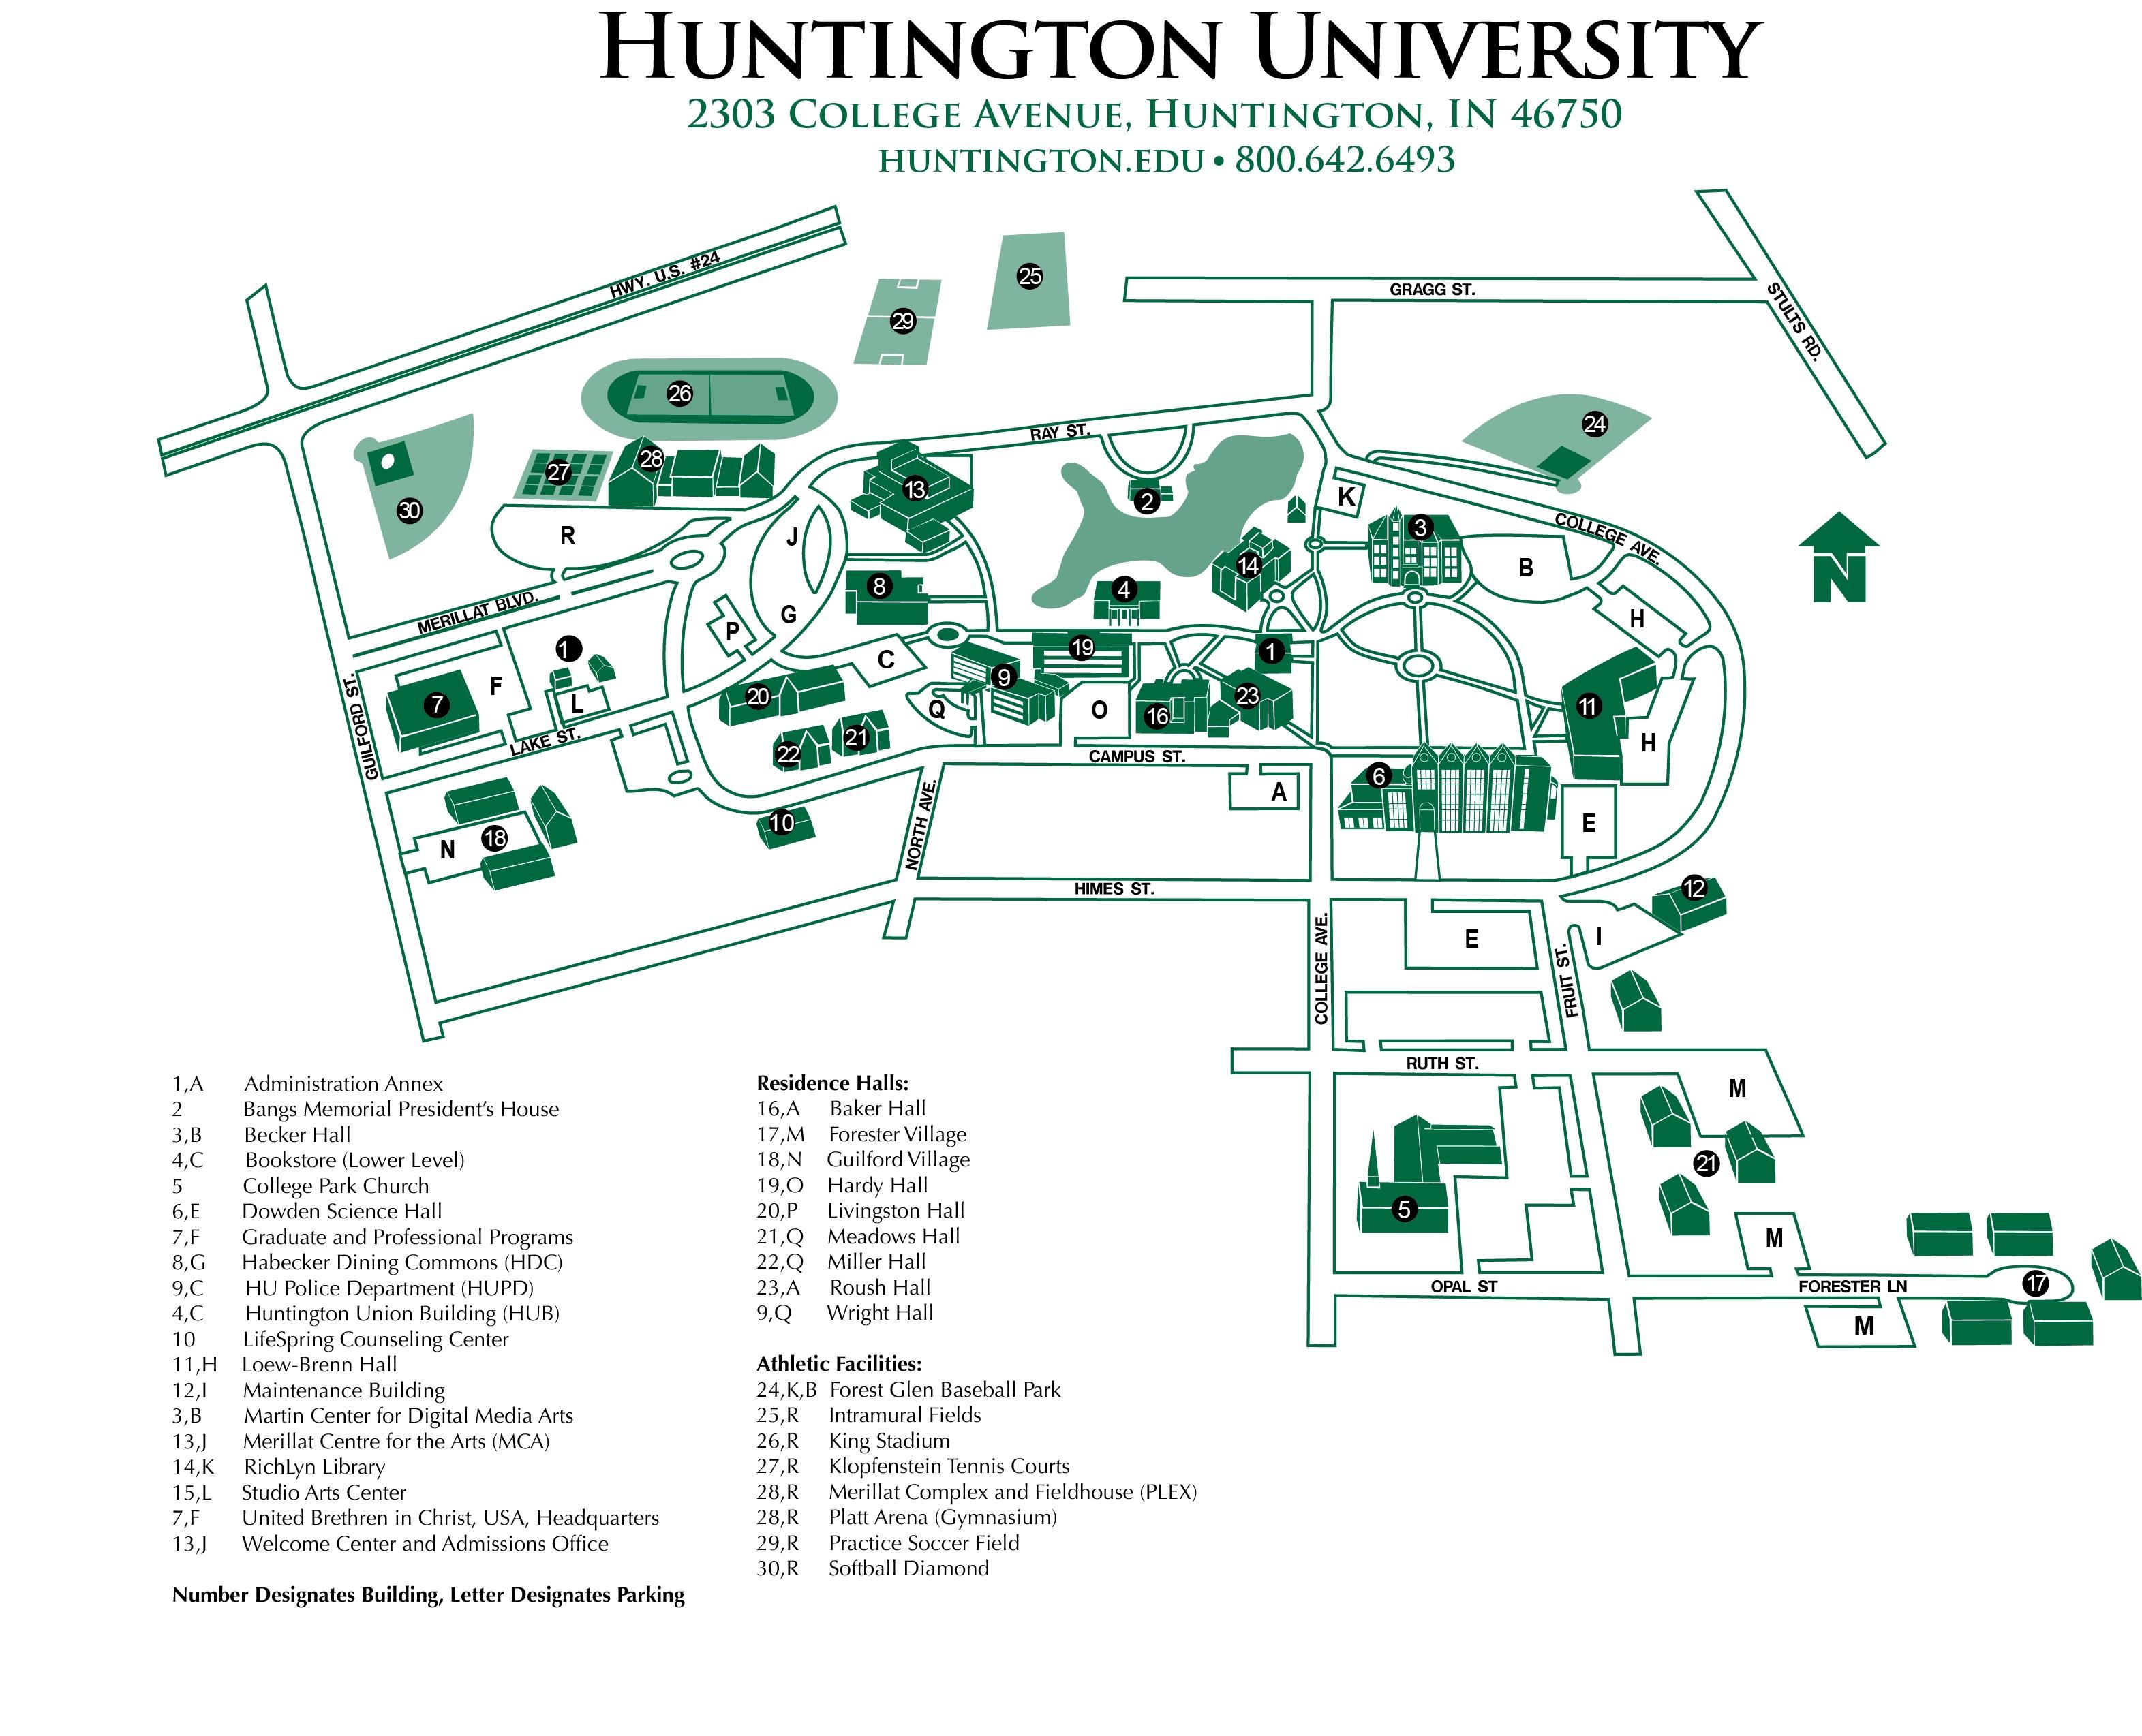 huntington university campus map Portfolio Mysite huntington university campus map